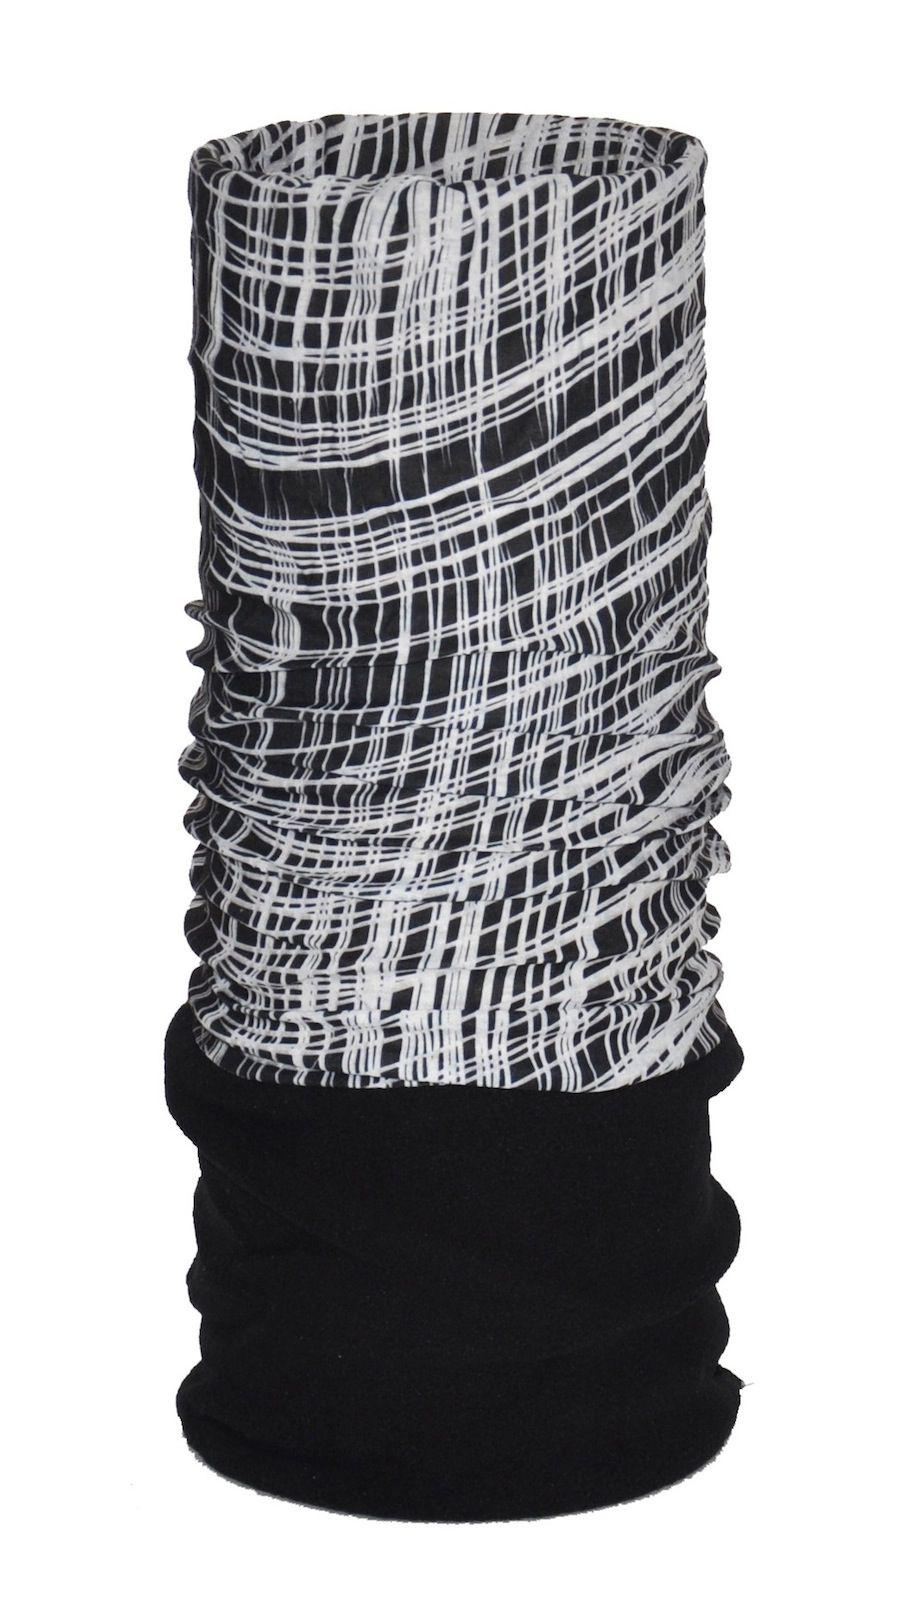 O3 USA Kids Fleece Rag Tops Convertible Headwear - Wavy Mesh Black